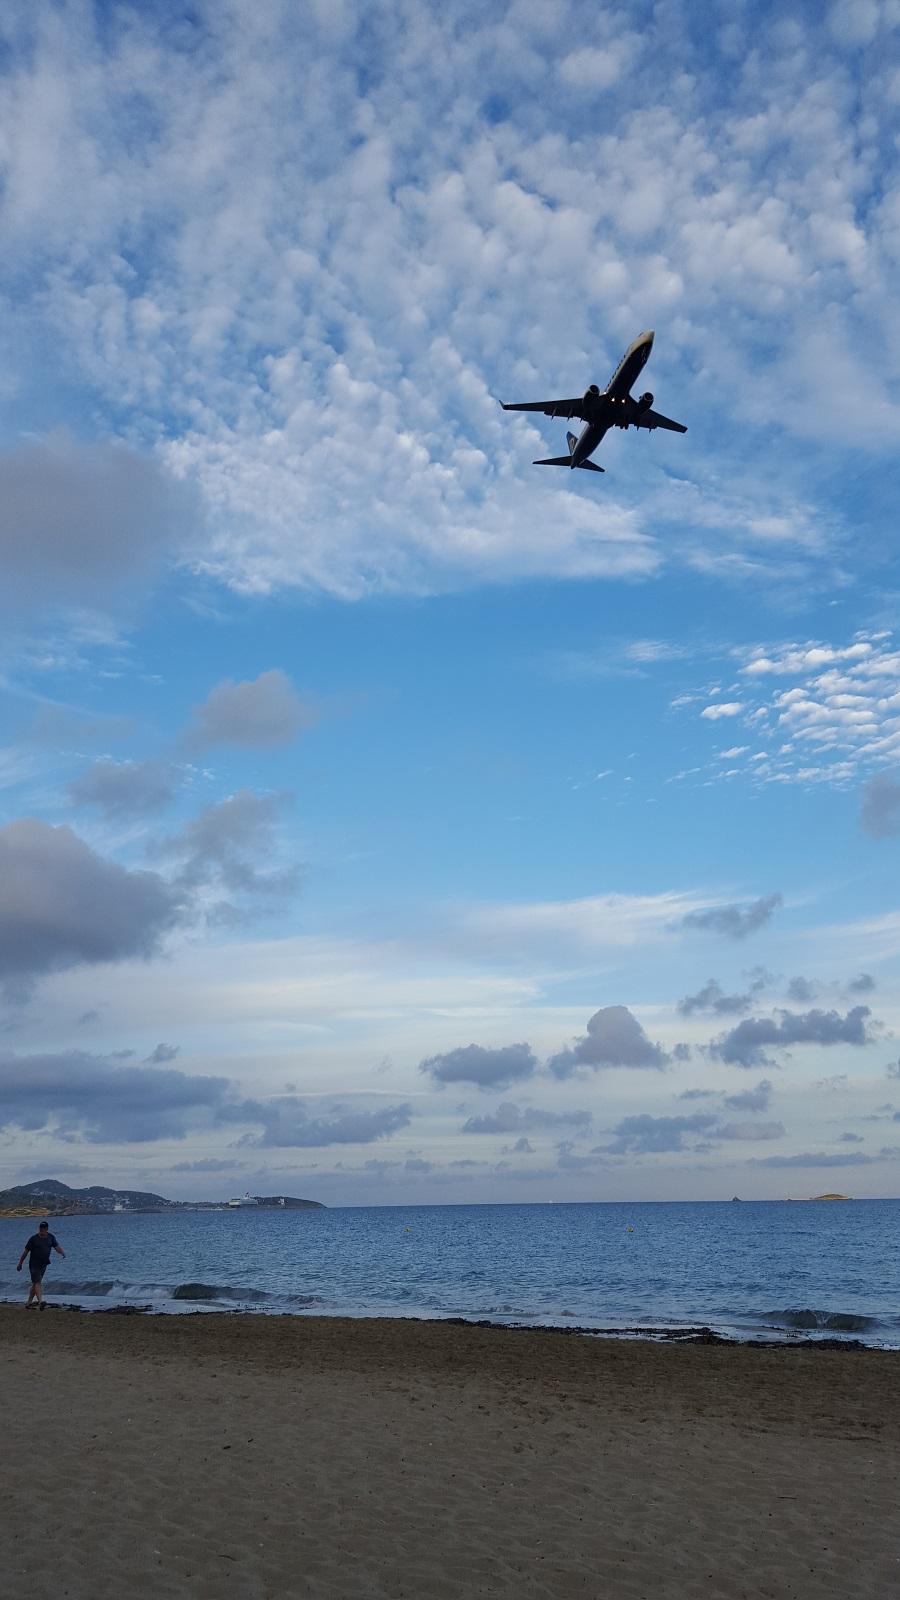 ibiza plage avion small